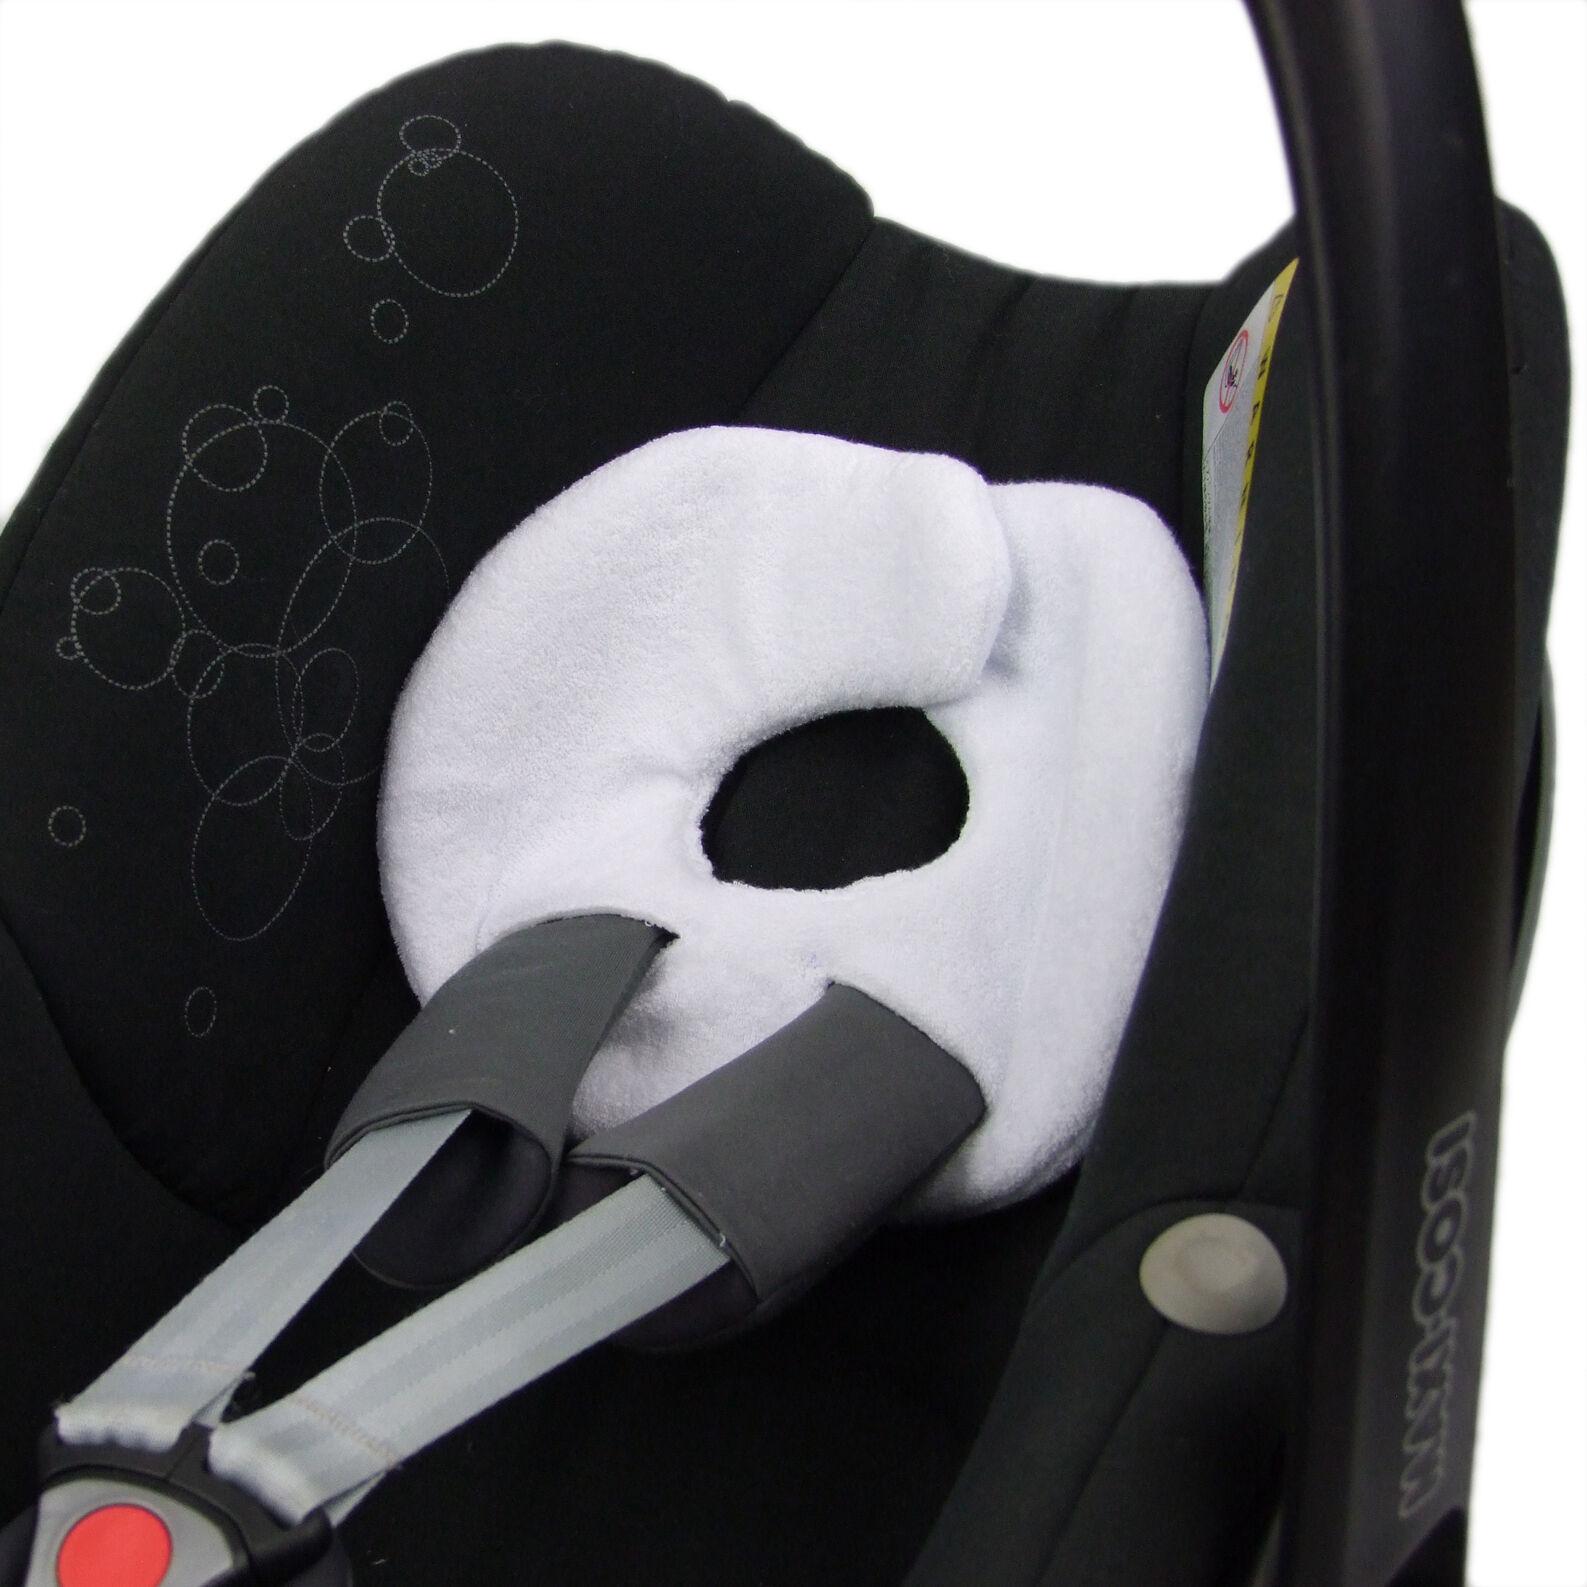 BAMBINIWELT Kopfstütze Kopfpolster für Babyschale MAXI-COSI Pebble, Pebble Plus 9. Frottee Weiß